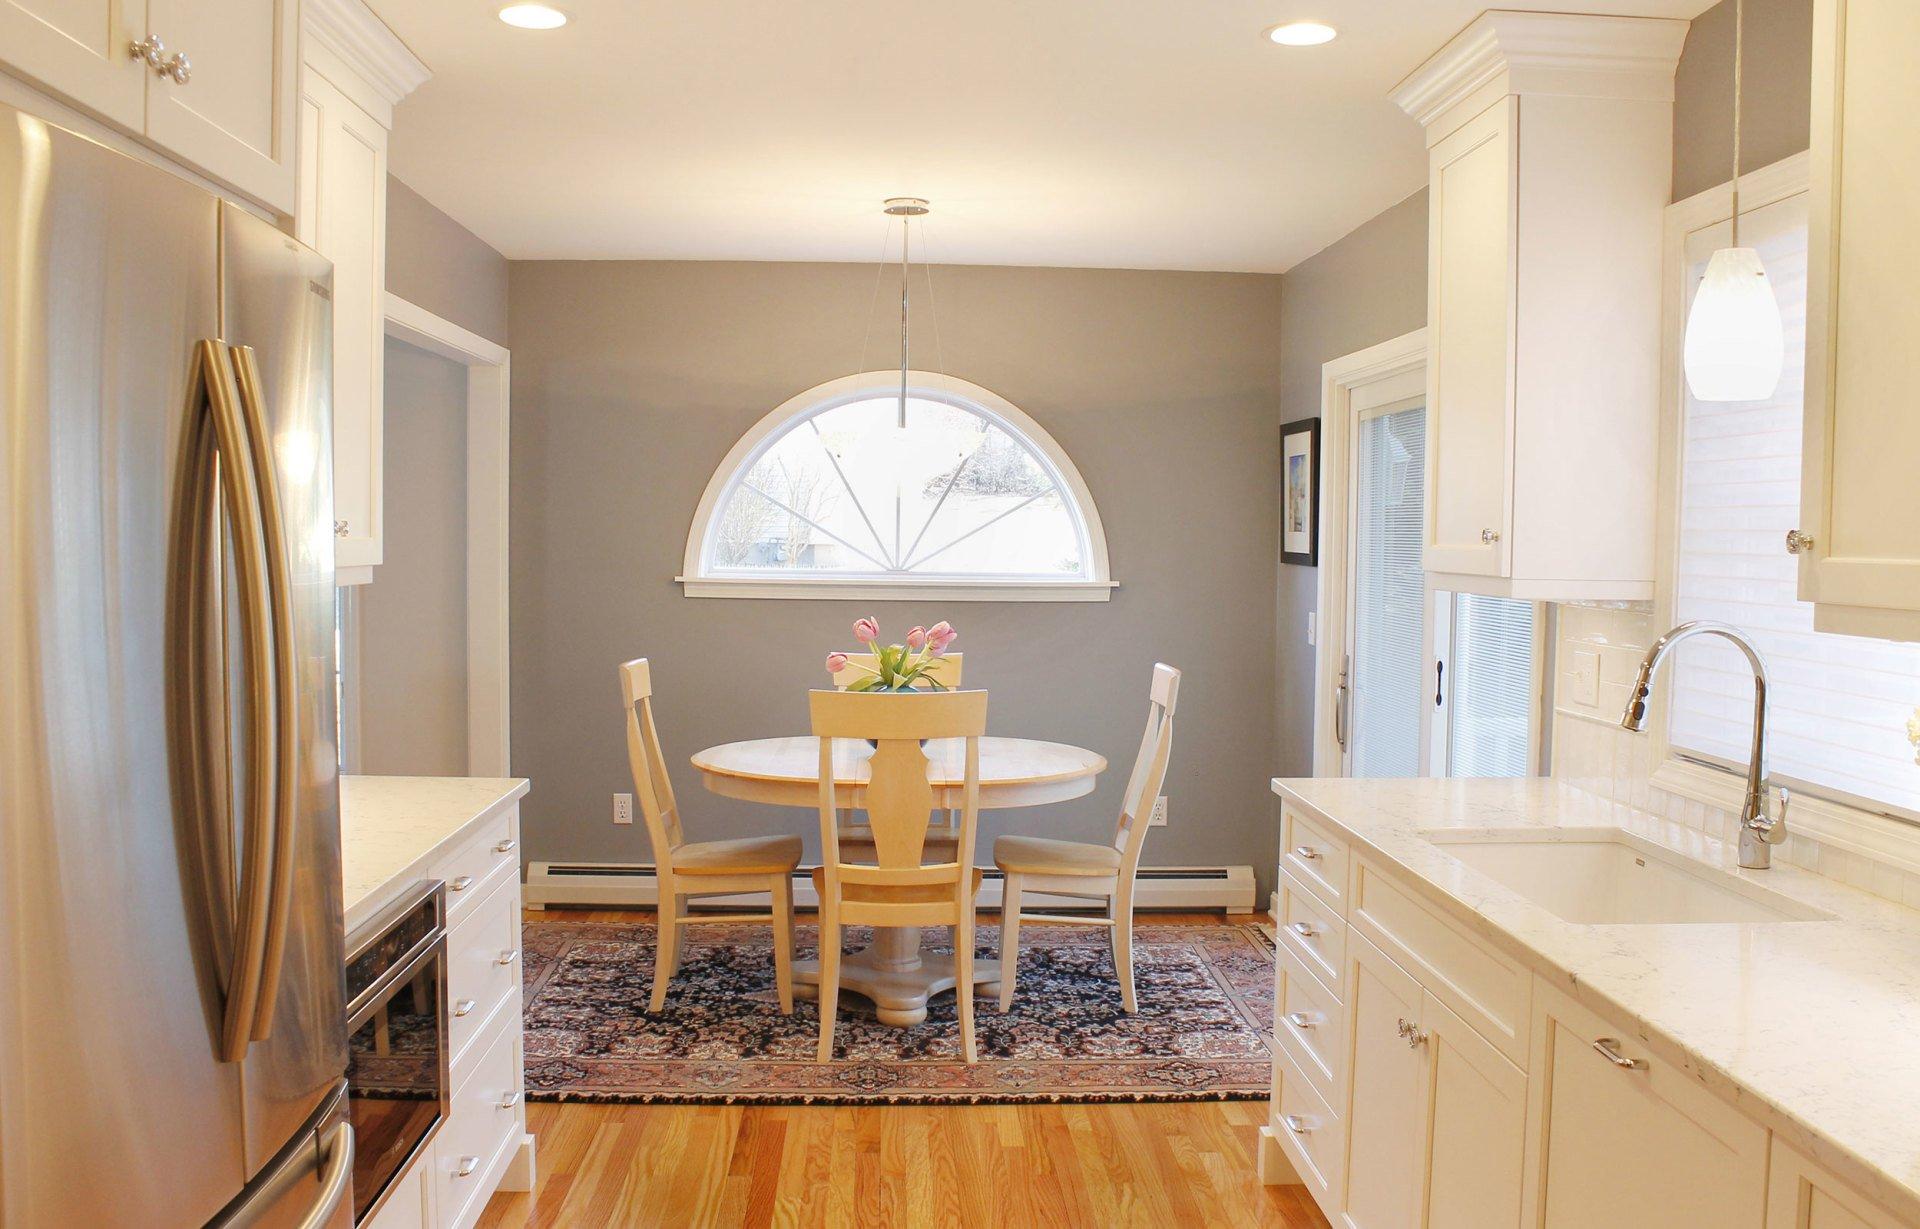 christino kitchens & remodeling | renovations glastonbury ct